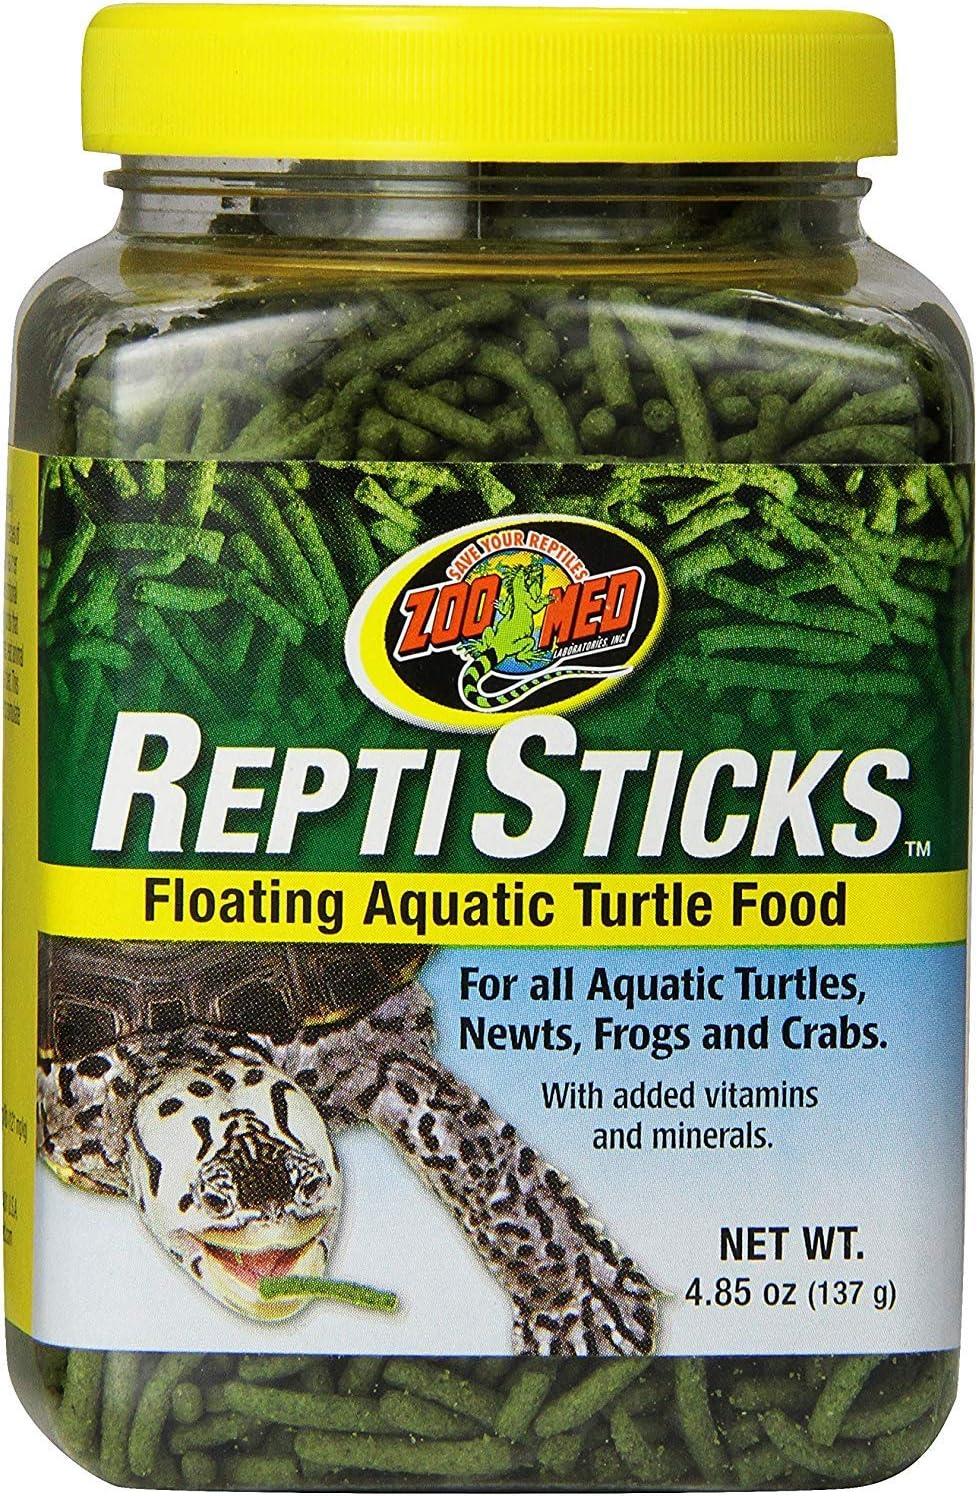 Zoo Med Reptisticks - Floating Aquatic Turtle Food 5 oz - Pack of 3